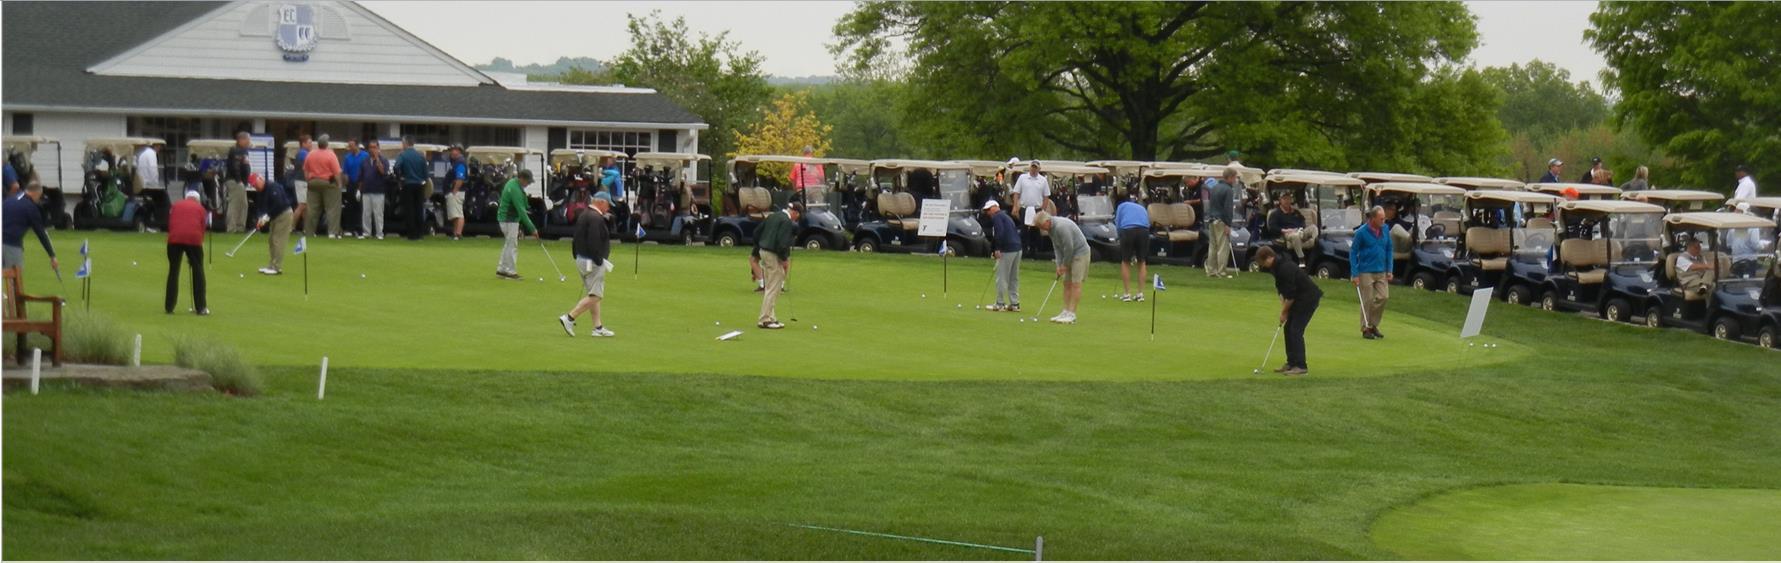 Golf Page Header Image